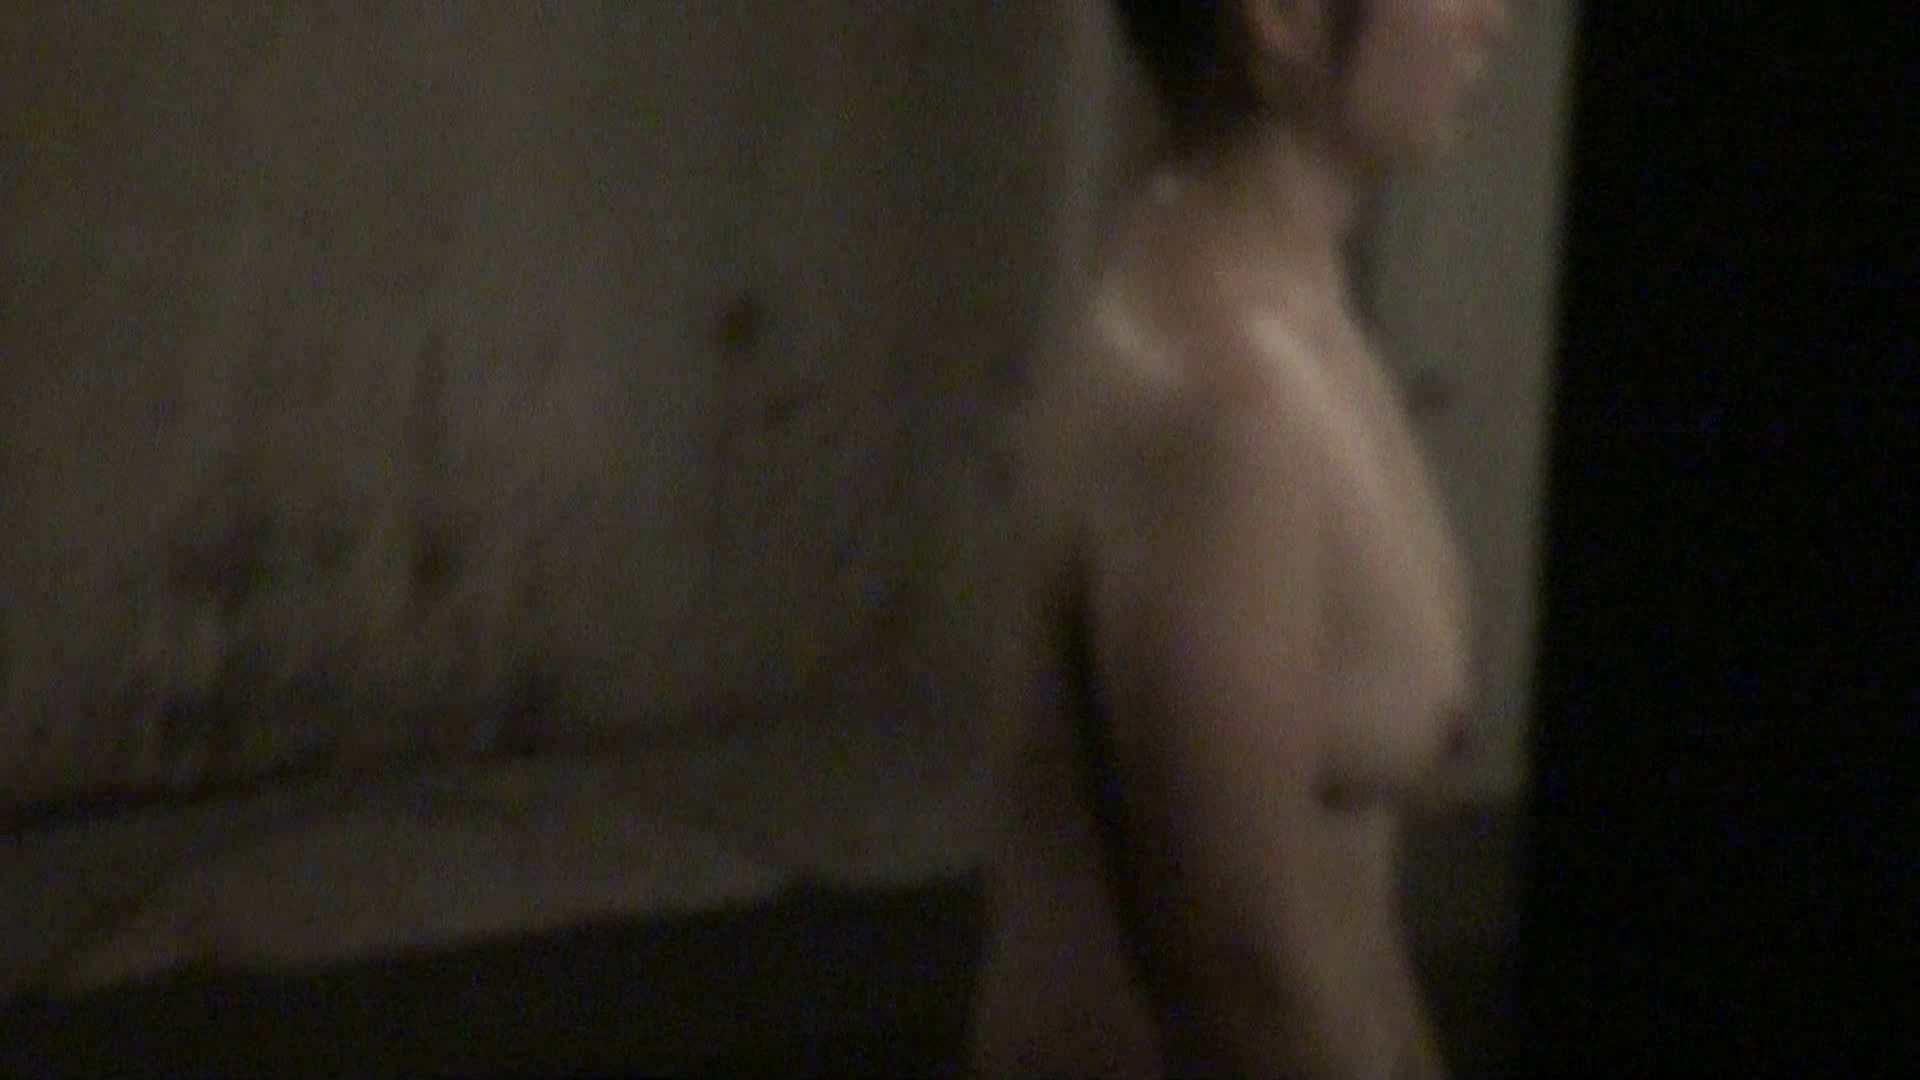 Aquaな露天風呂Vol.337 いやらしいOL オマンコ無修正動画無料 33連発 6